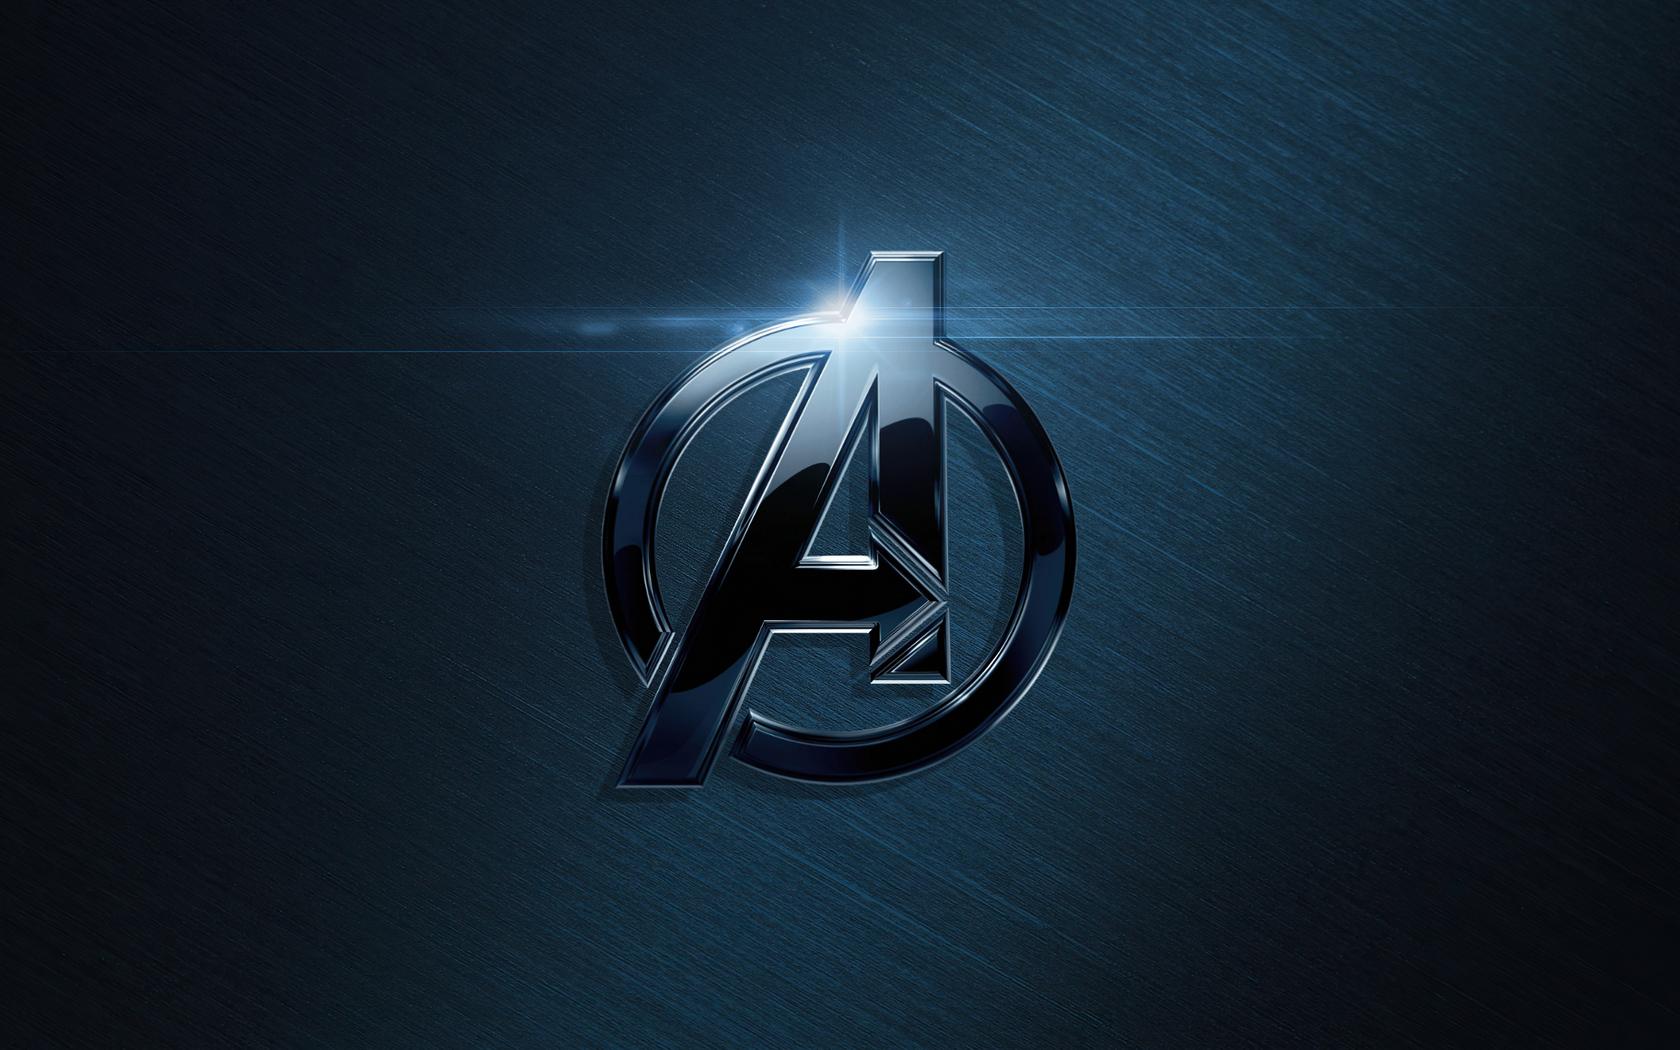 the-avengers-metal-logo-4k-id.jpg